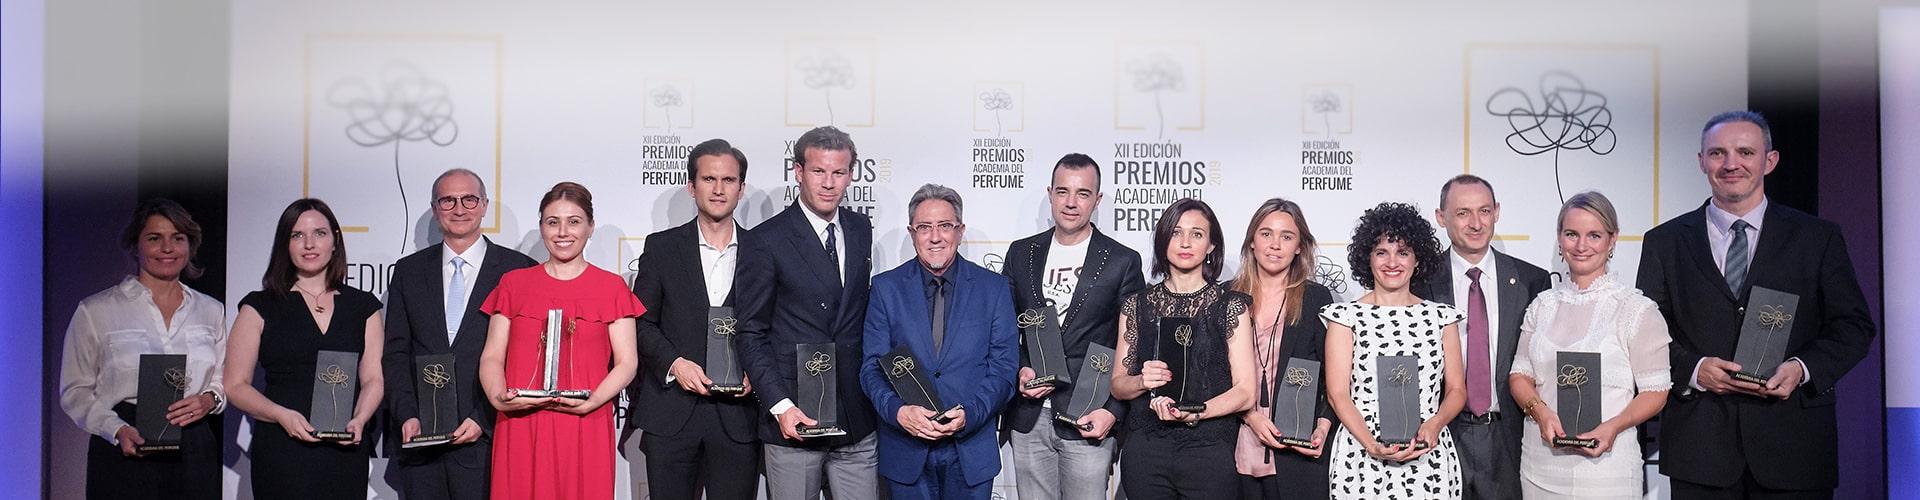 premieados 2019